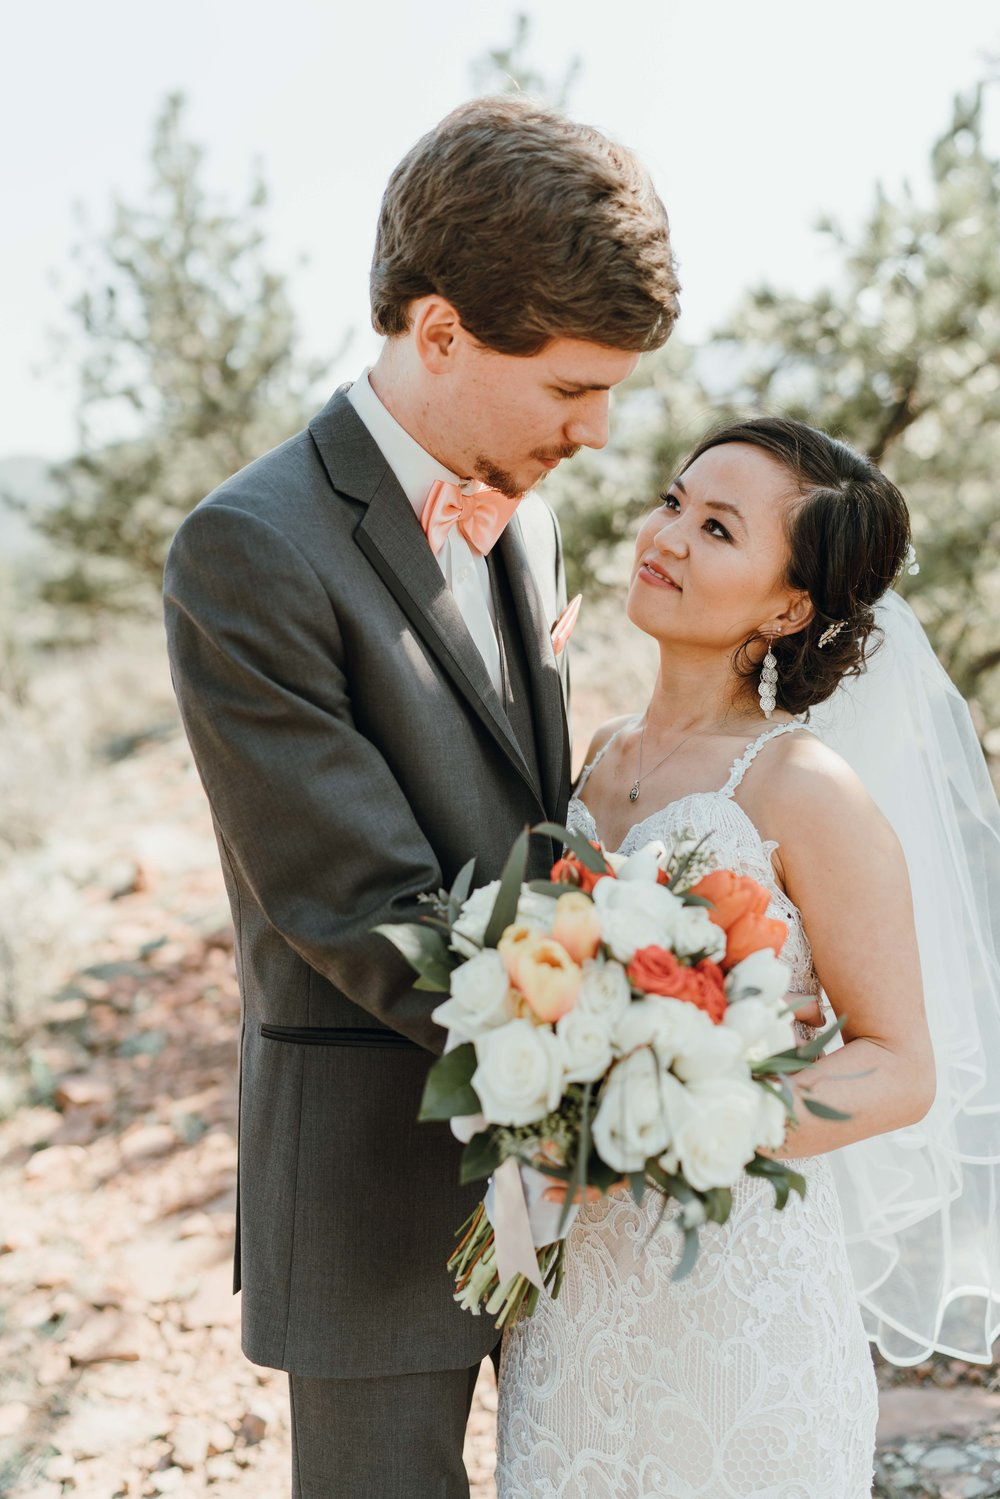 denver wedding photographer lioncrest manor in lyons ben and mali -DSC06150.jpg